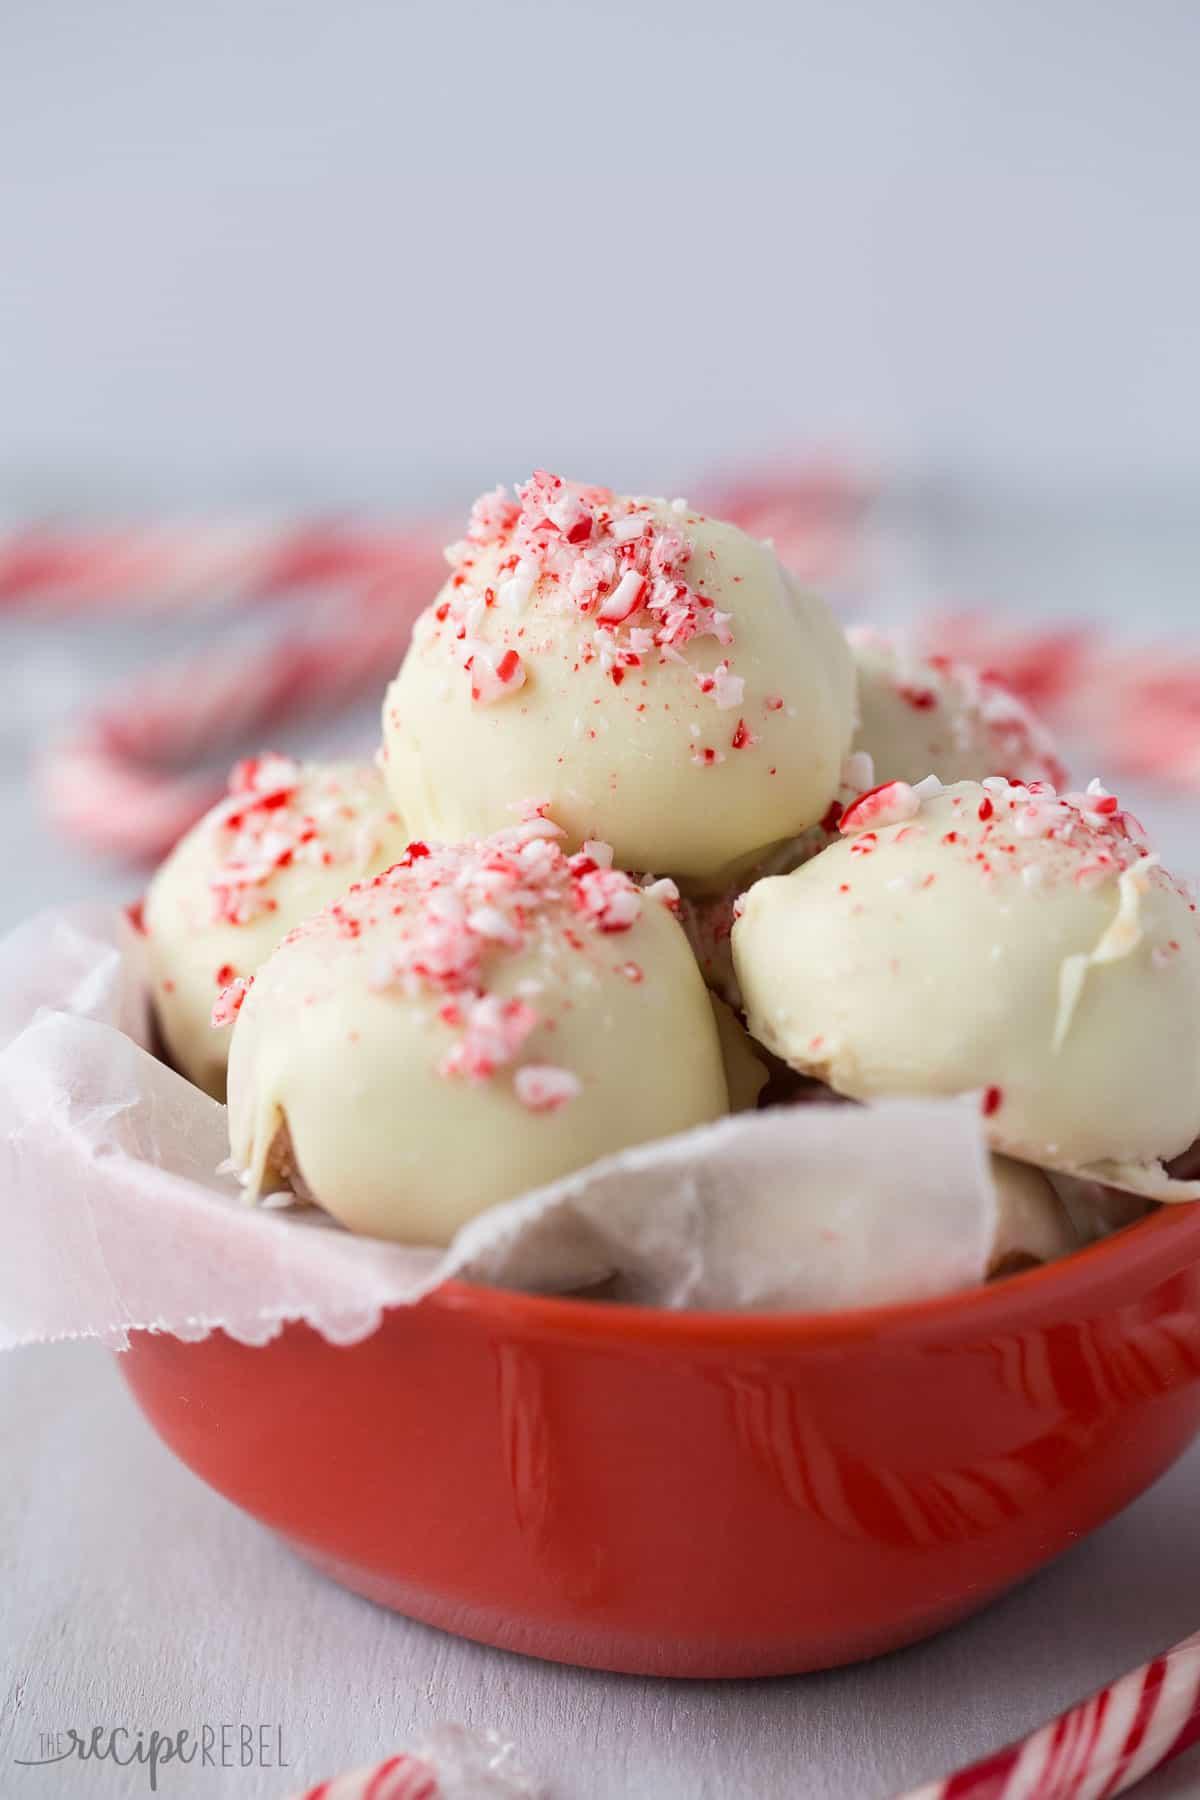 White Chocolate Candy Recipes For Christmas  No Bake White Chocolate Peppermint Oreo Truffles